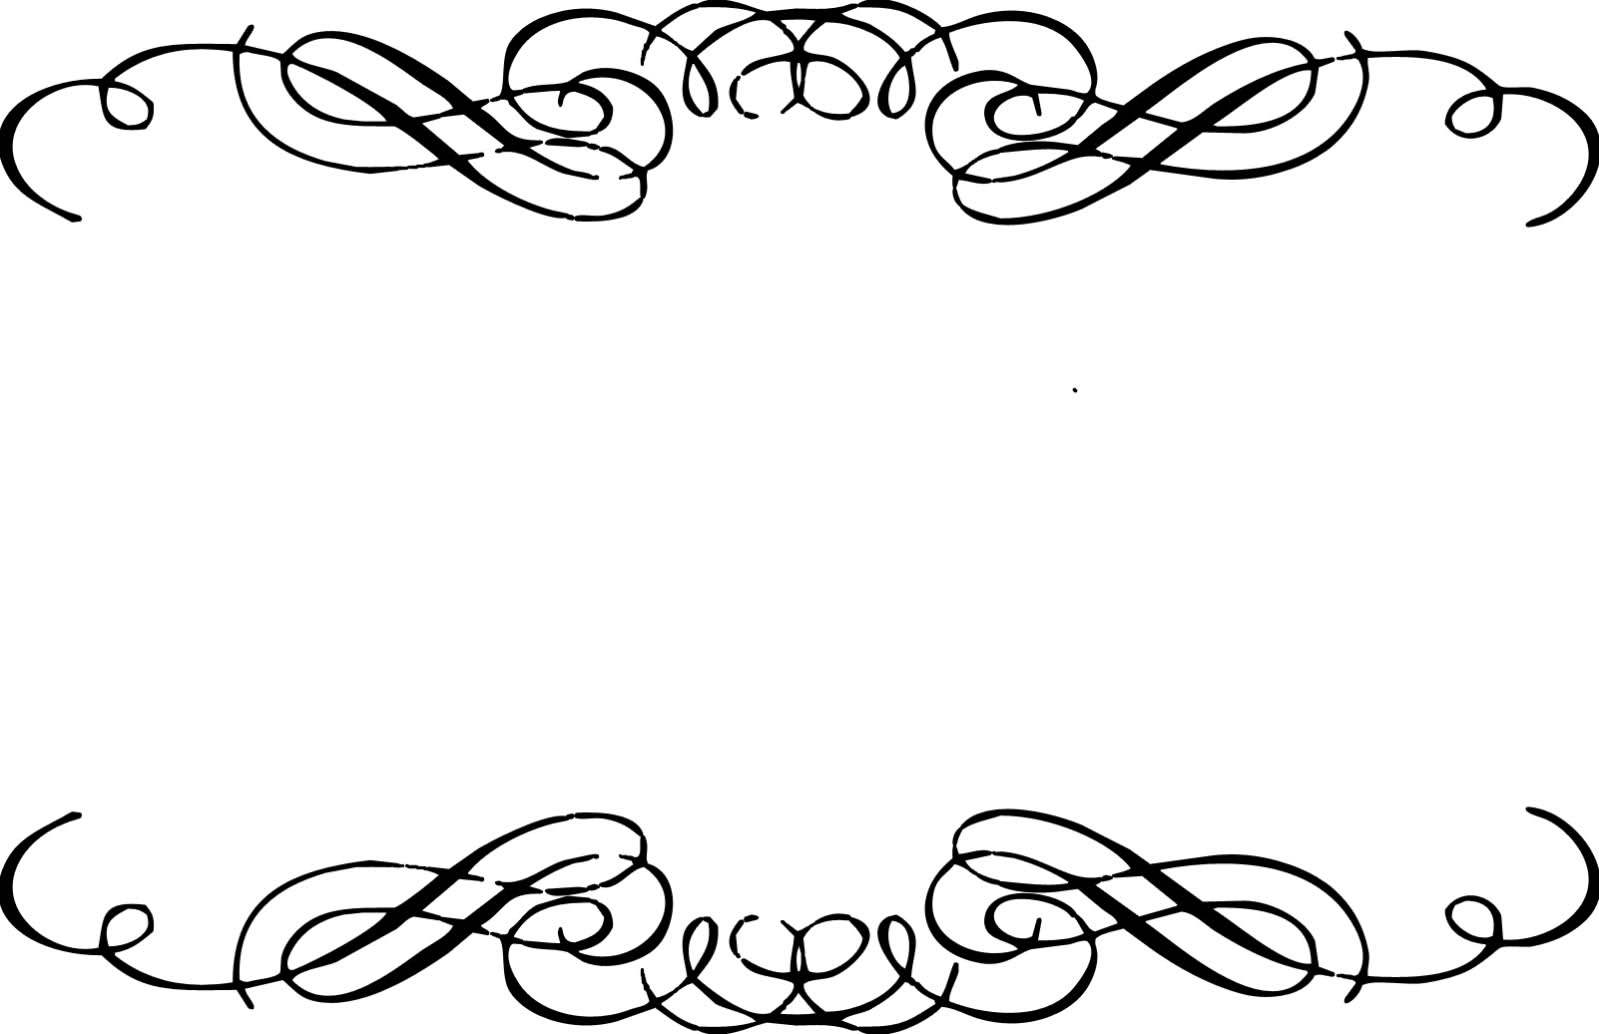 Swirl Border Clipart-swirl border clipart-16